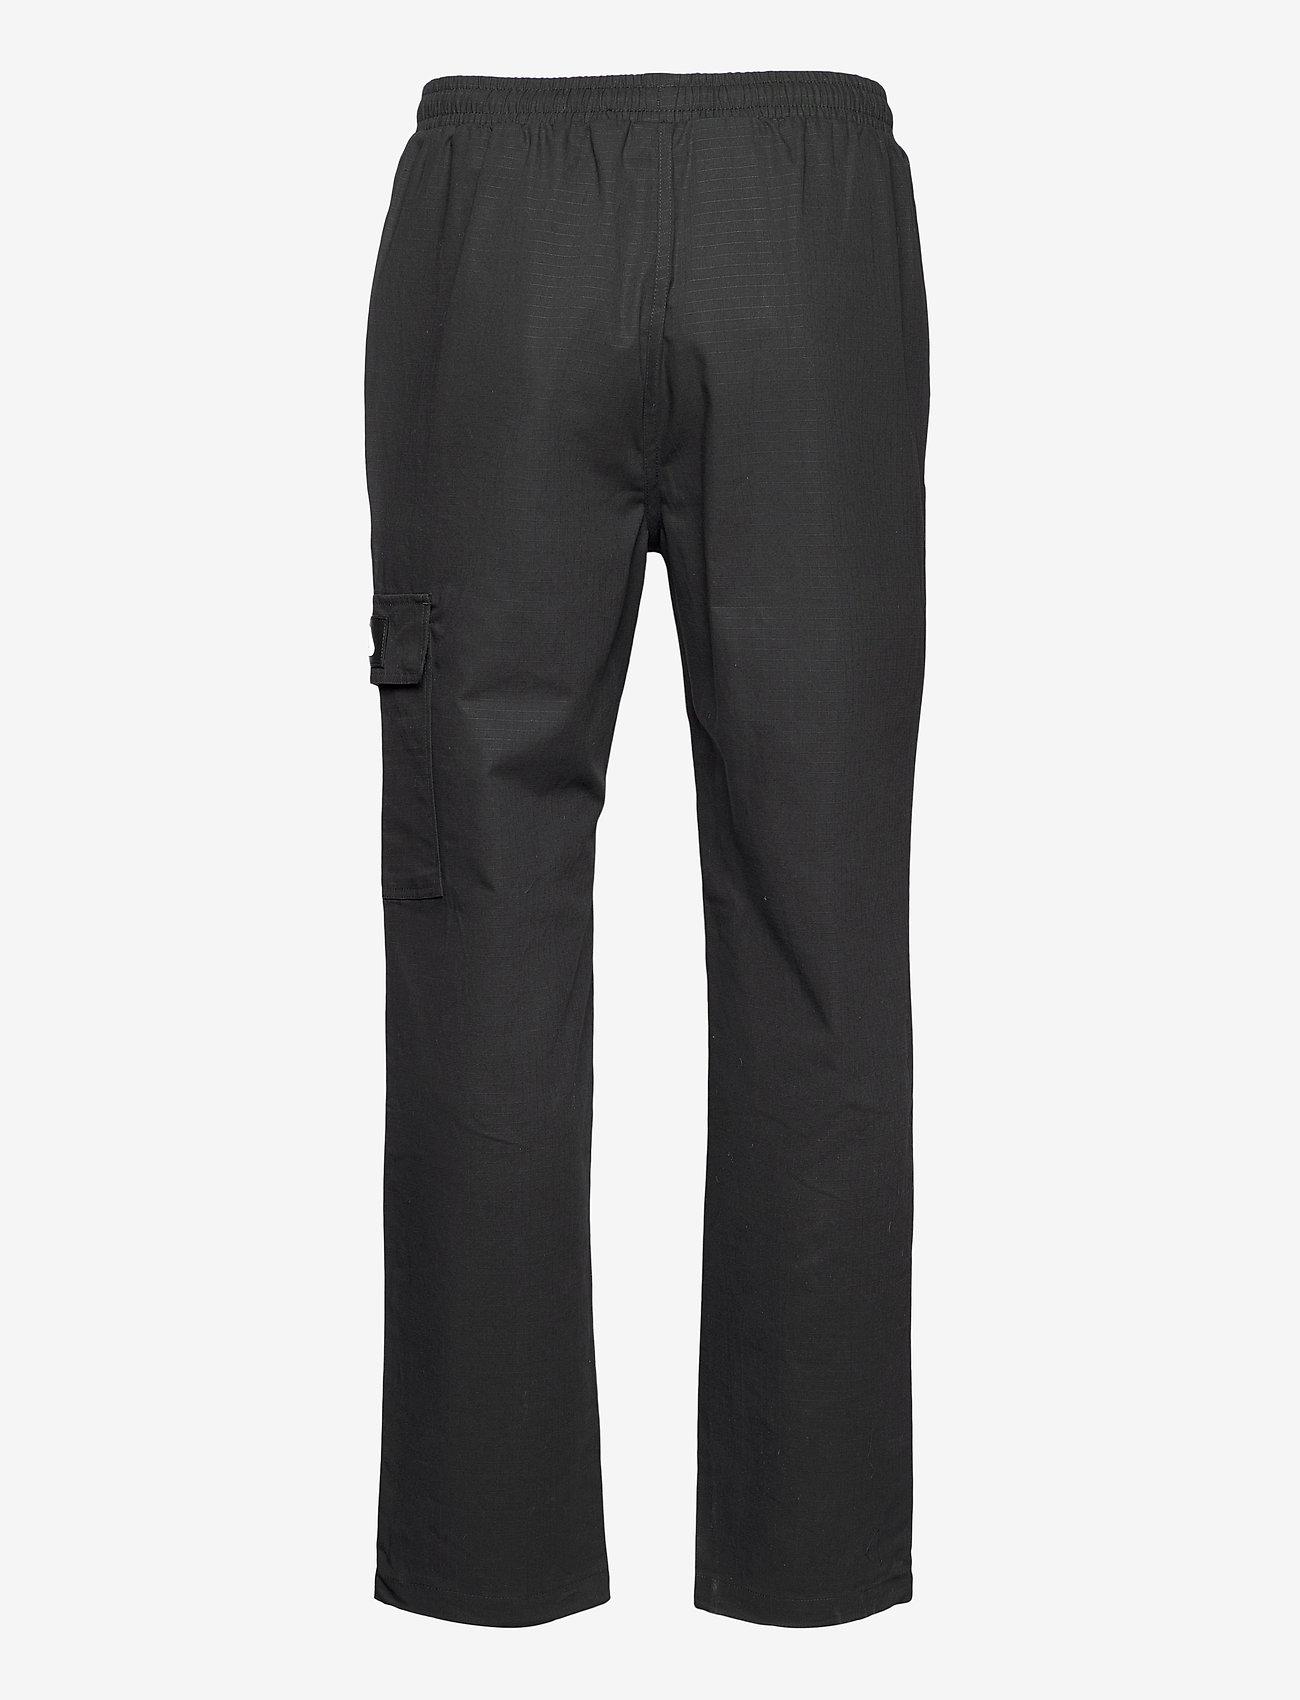 FILA - MEN CLEAVE cargo pants - pantalon cargo - black - 1